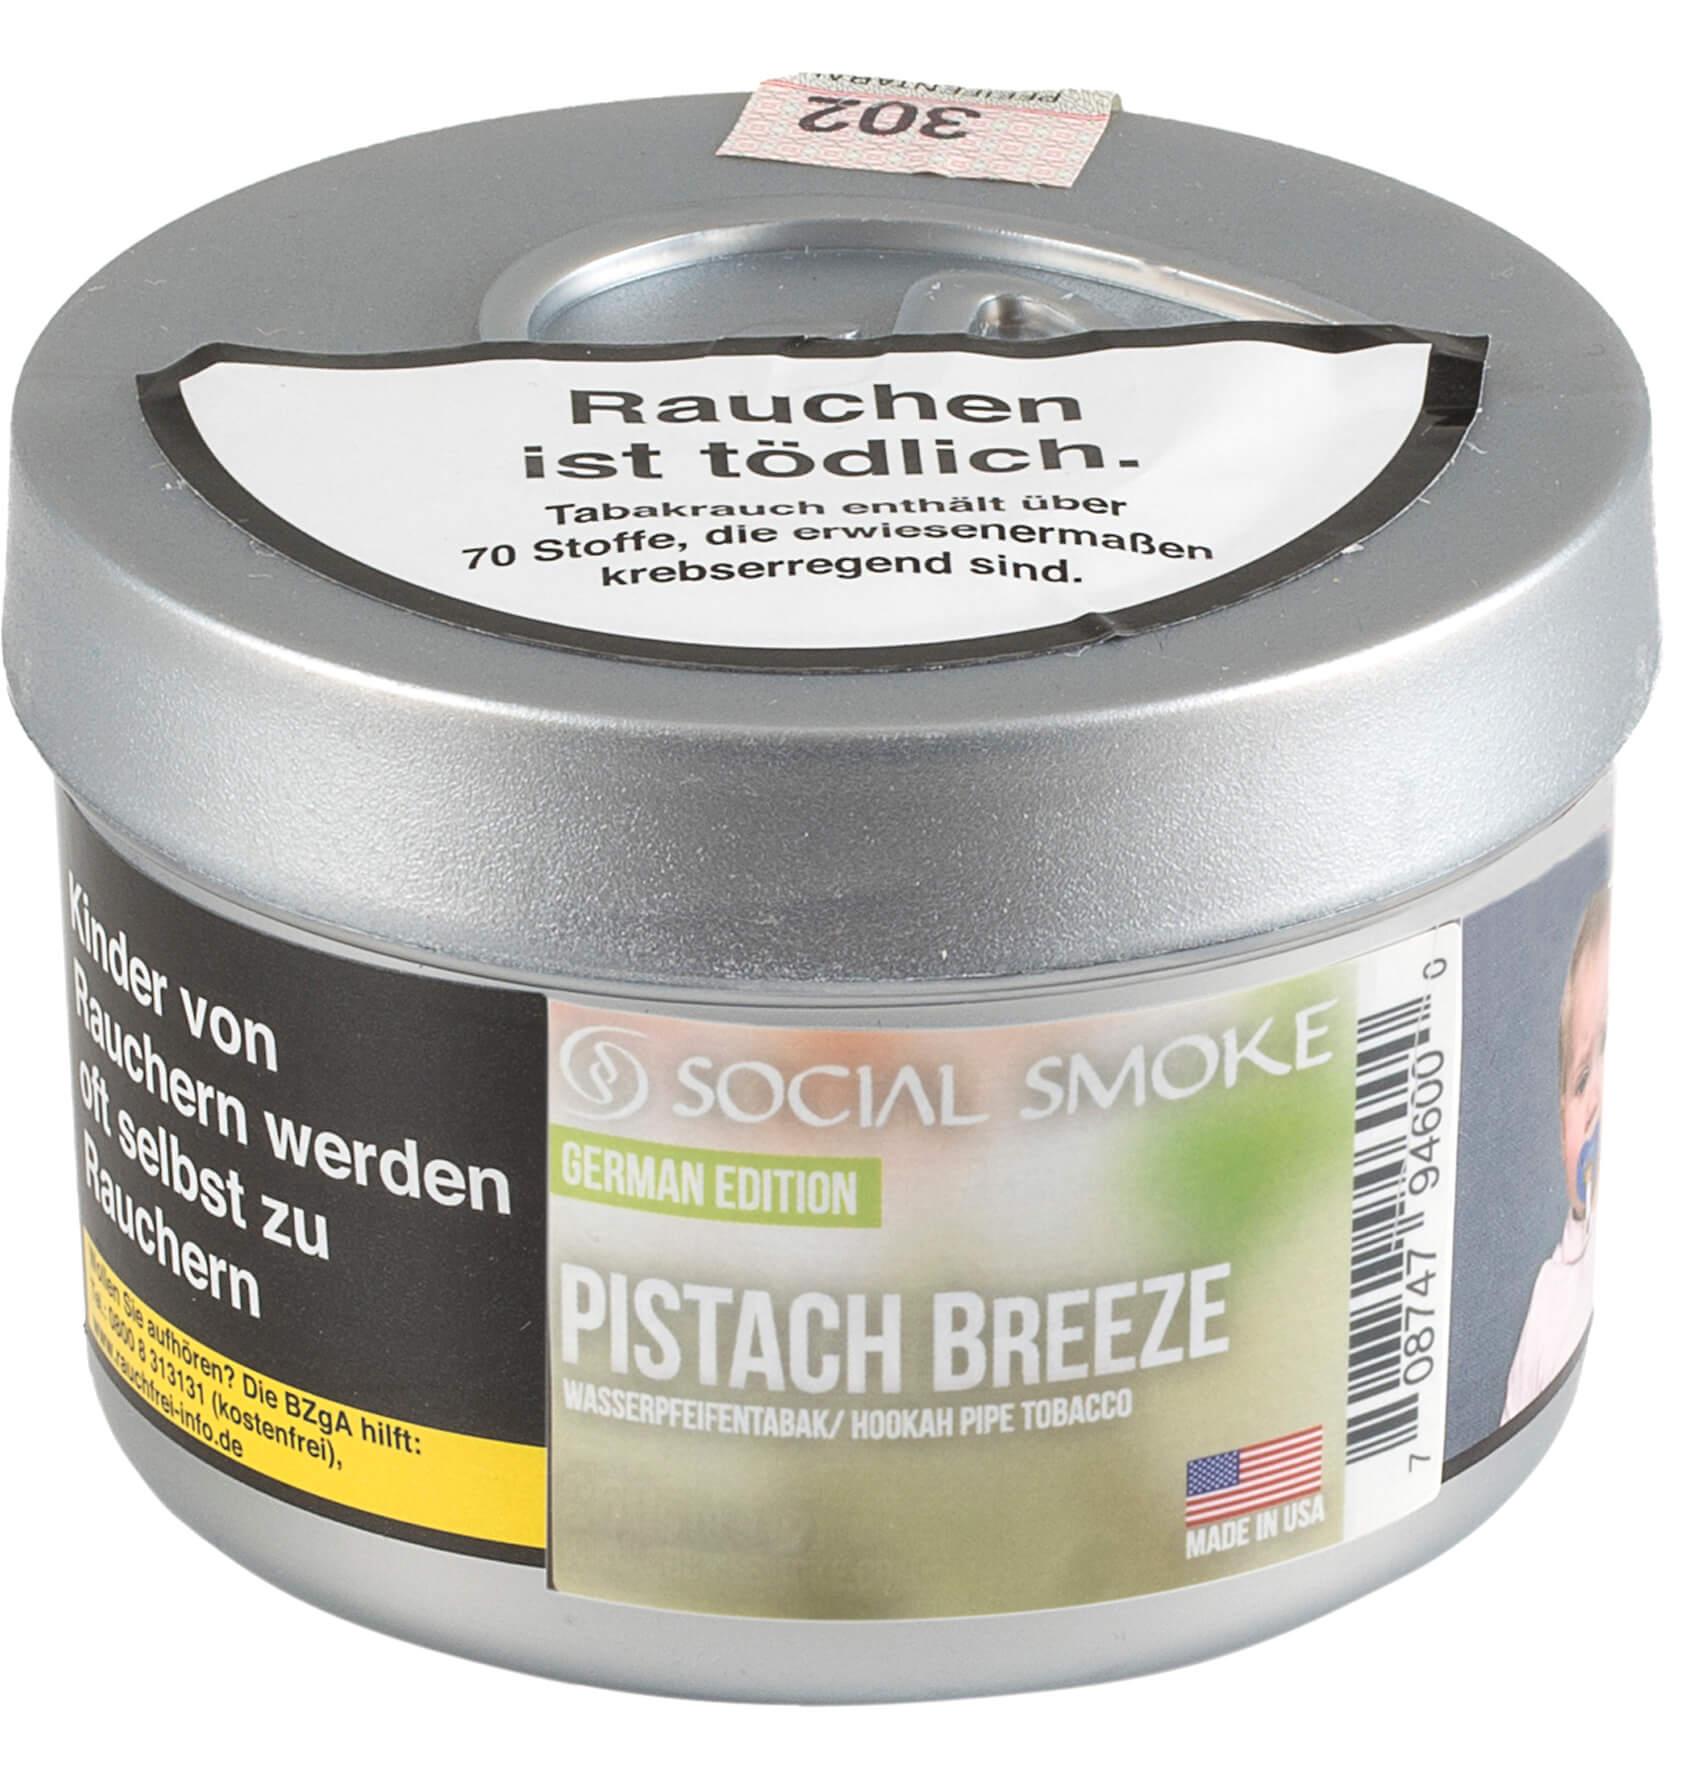 Social Smoke Tabak Pistach Breeze 100g Dose